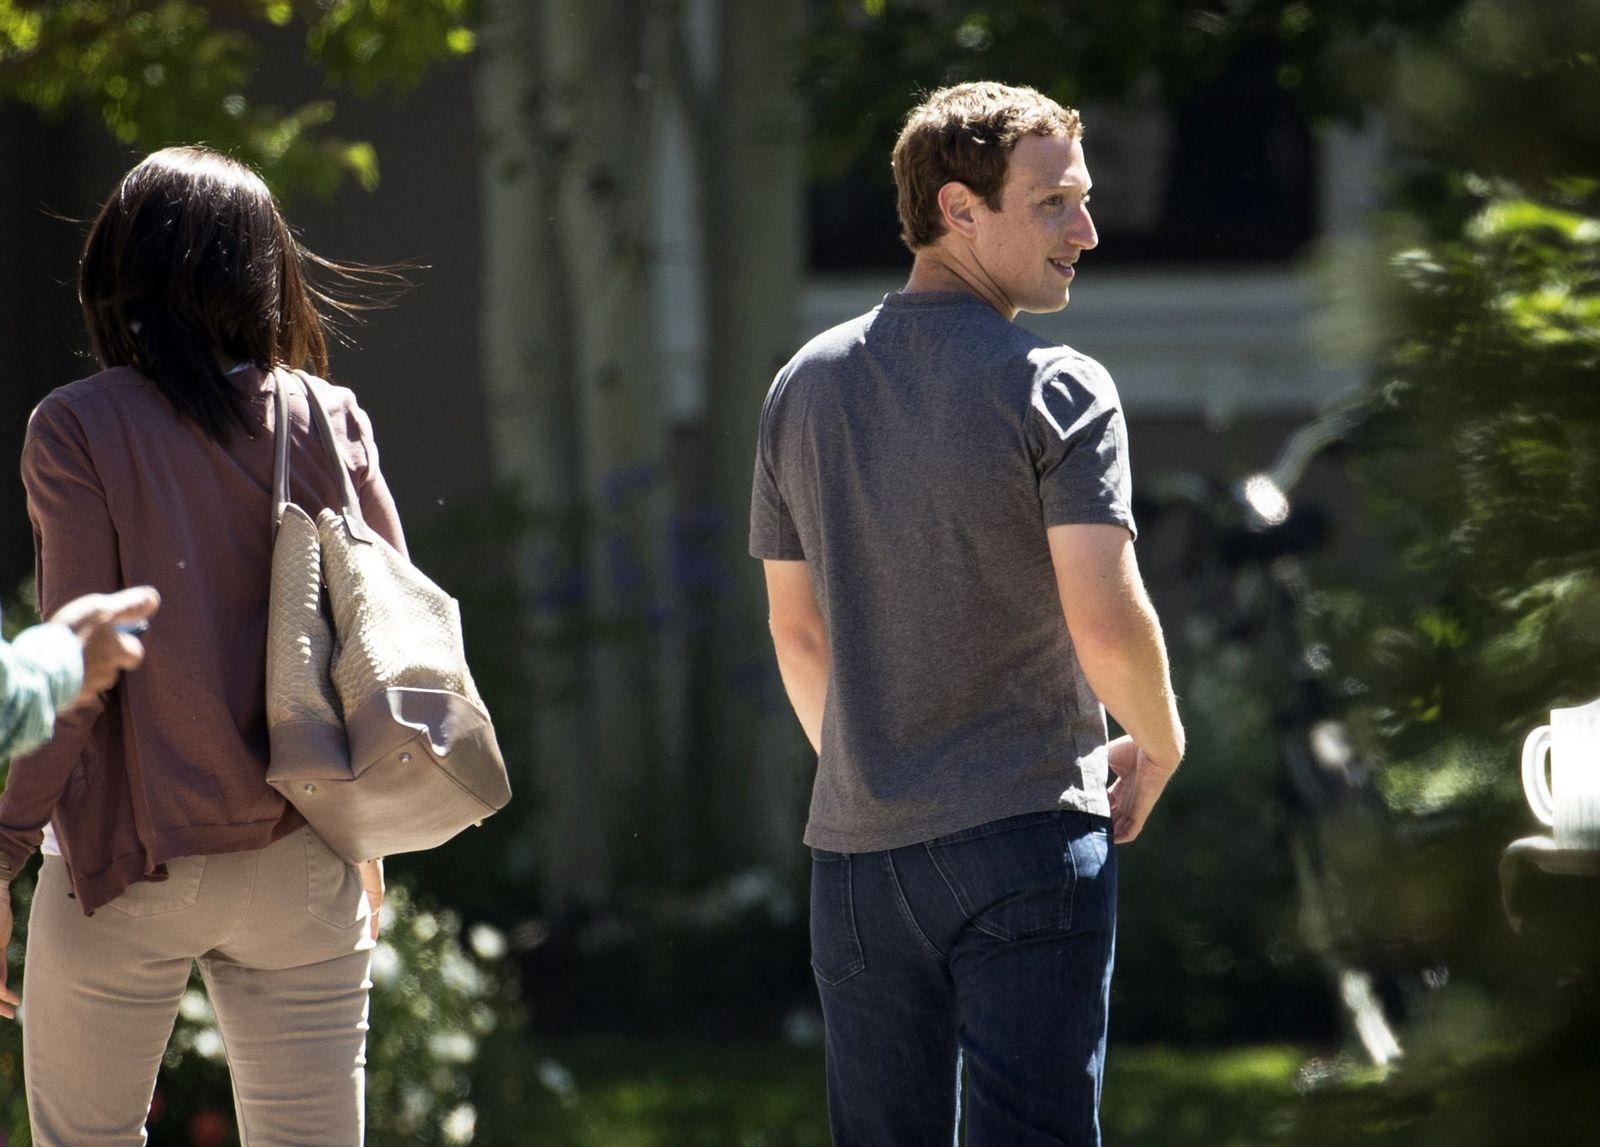 Sheryl Sandberg / Mark Zuckerberg